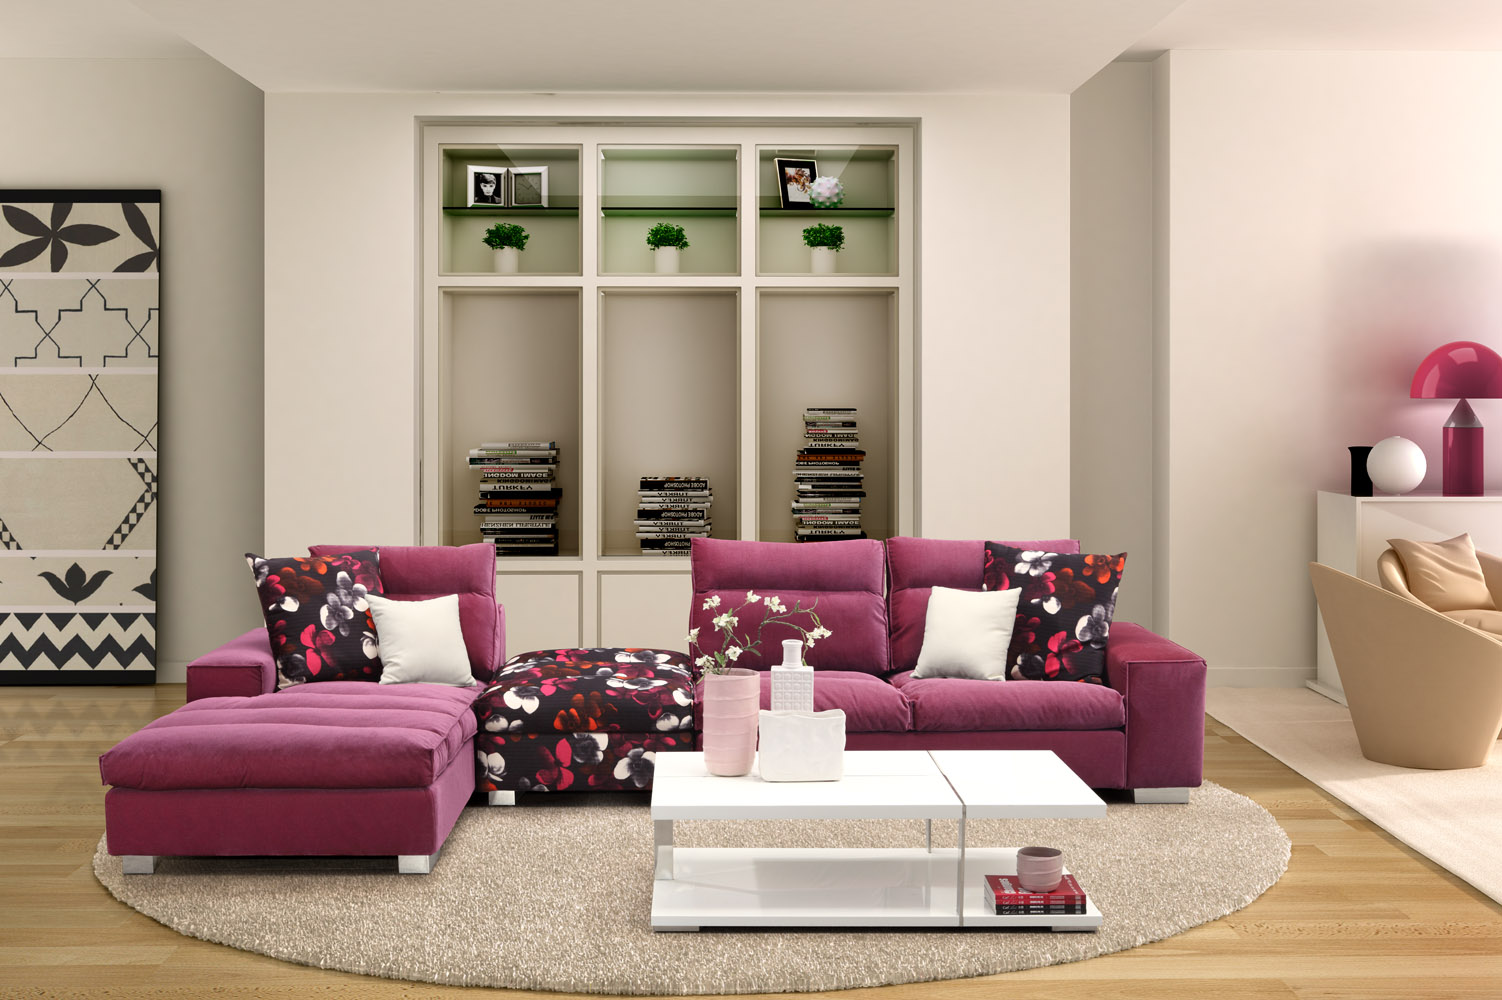 Good 3d Interior Design For Living Room